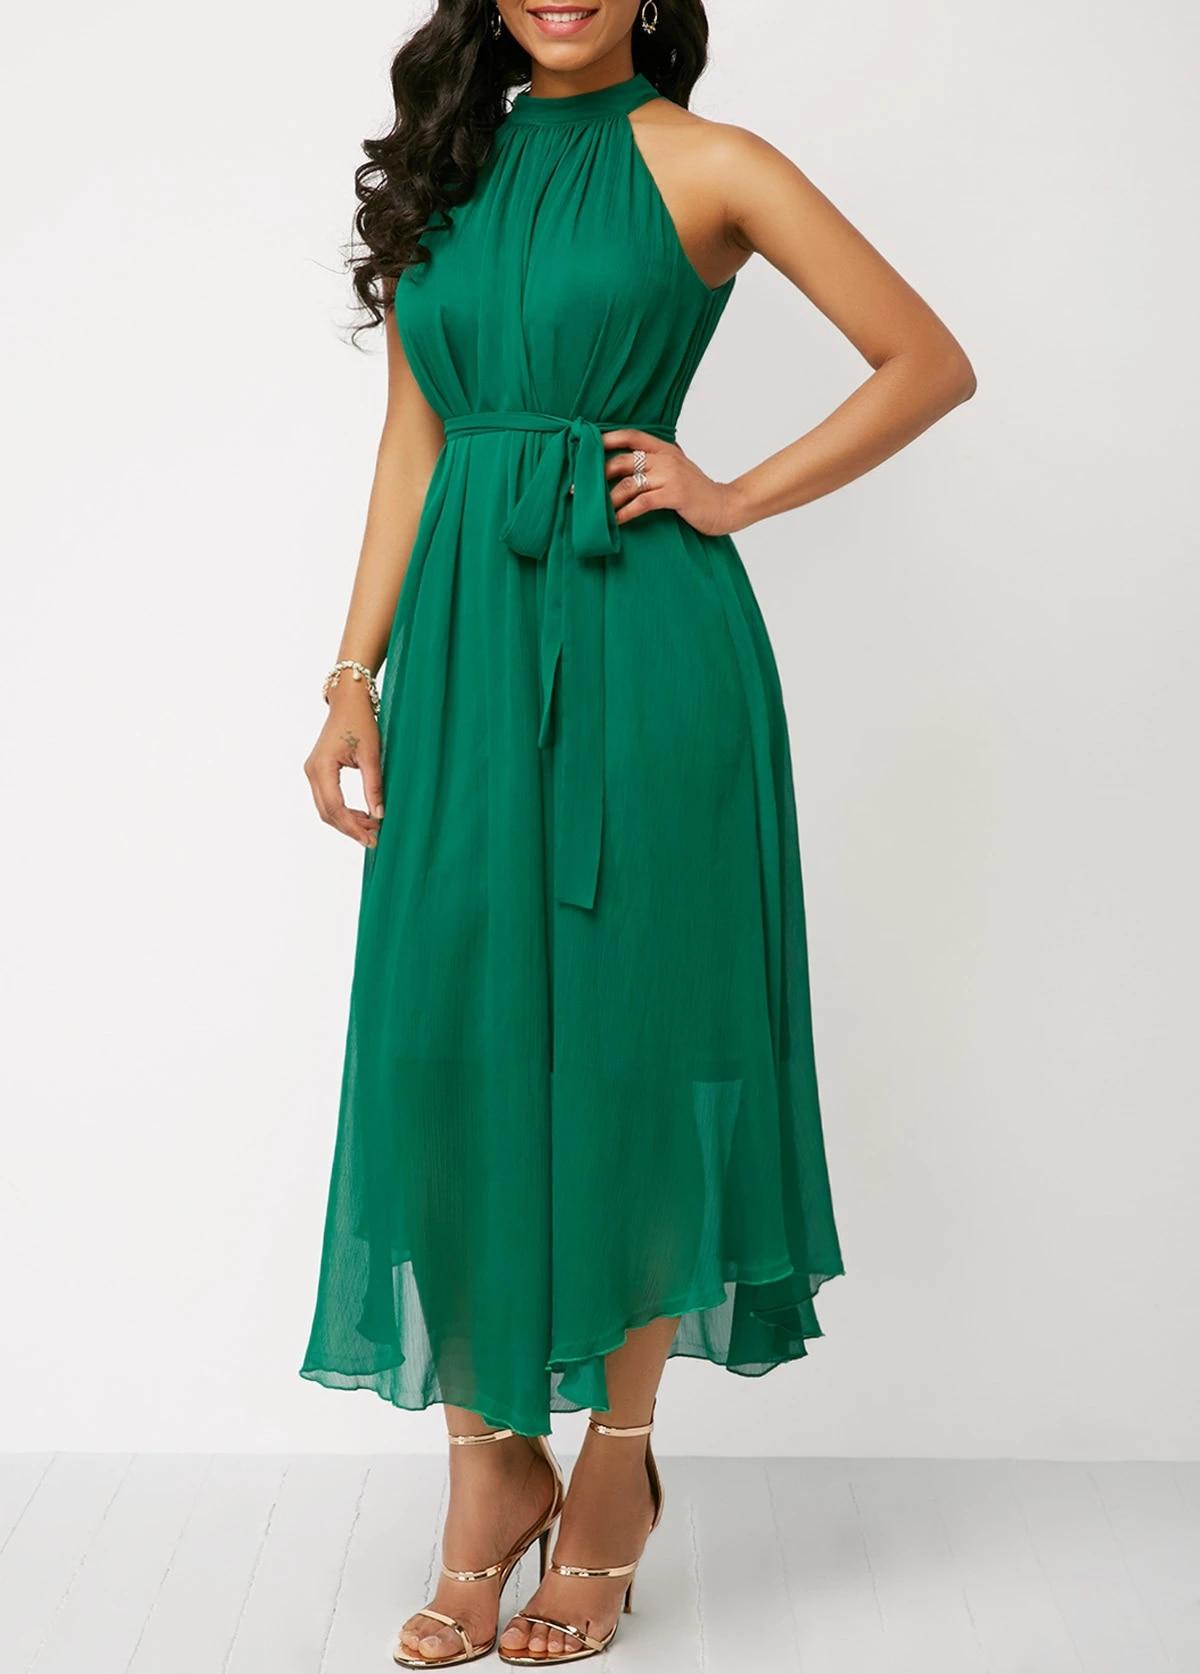 Plus sized Brand Women's Clothing 2021 Amazon AliExpress Wish Spring Summer  Halter Lace up Pleated Chiffon Dress|Dresses| - AliExpress